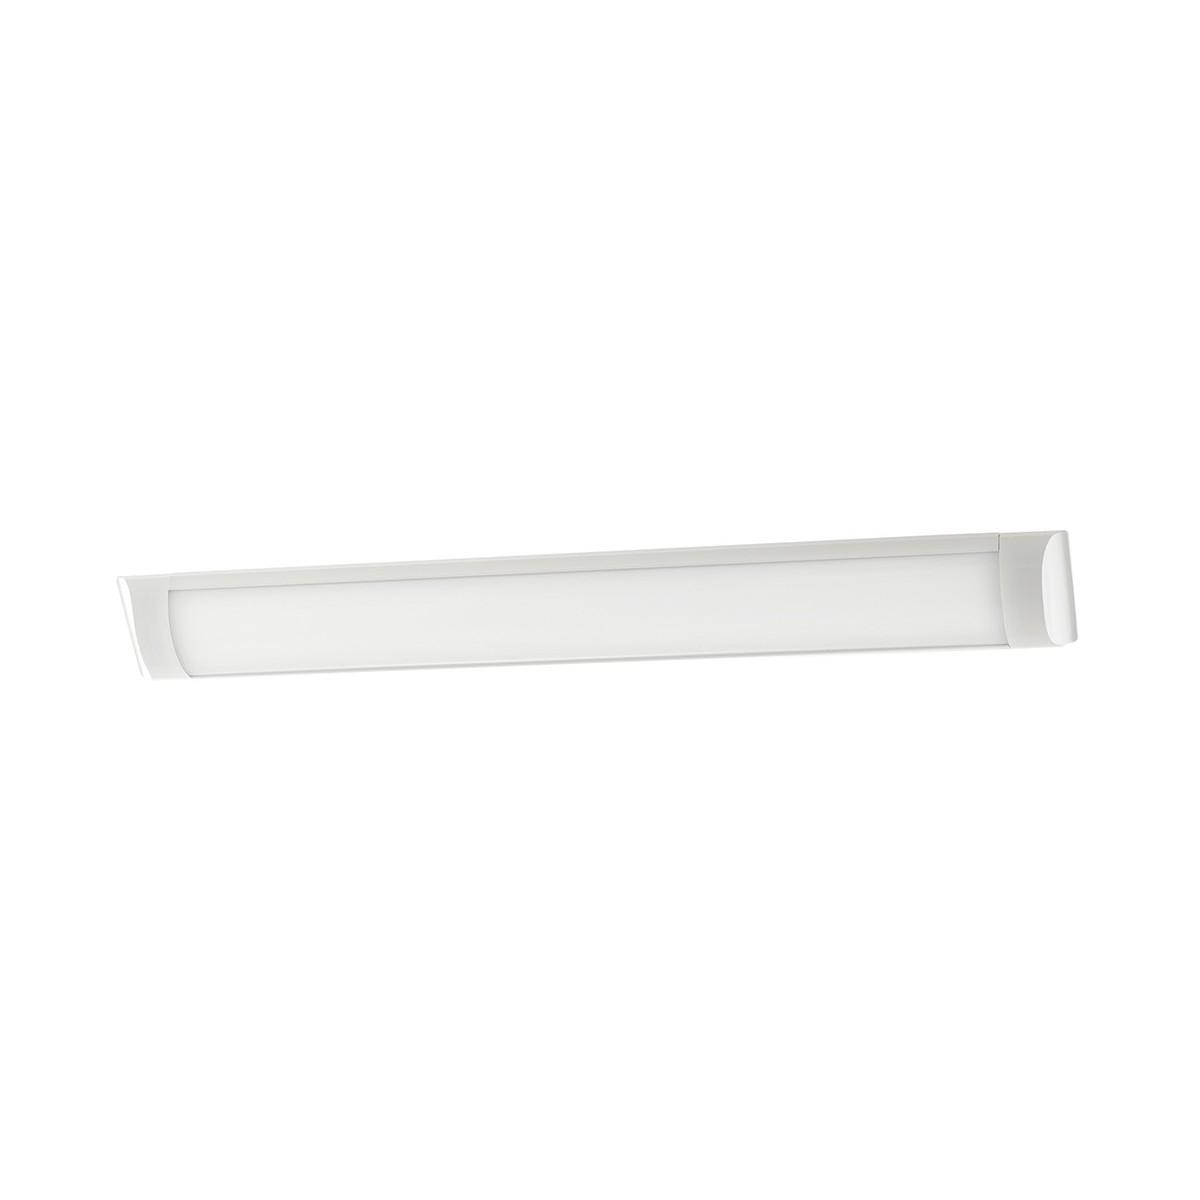 Applique LED blanche 36 watts 4000kelvin